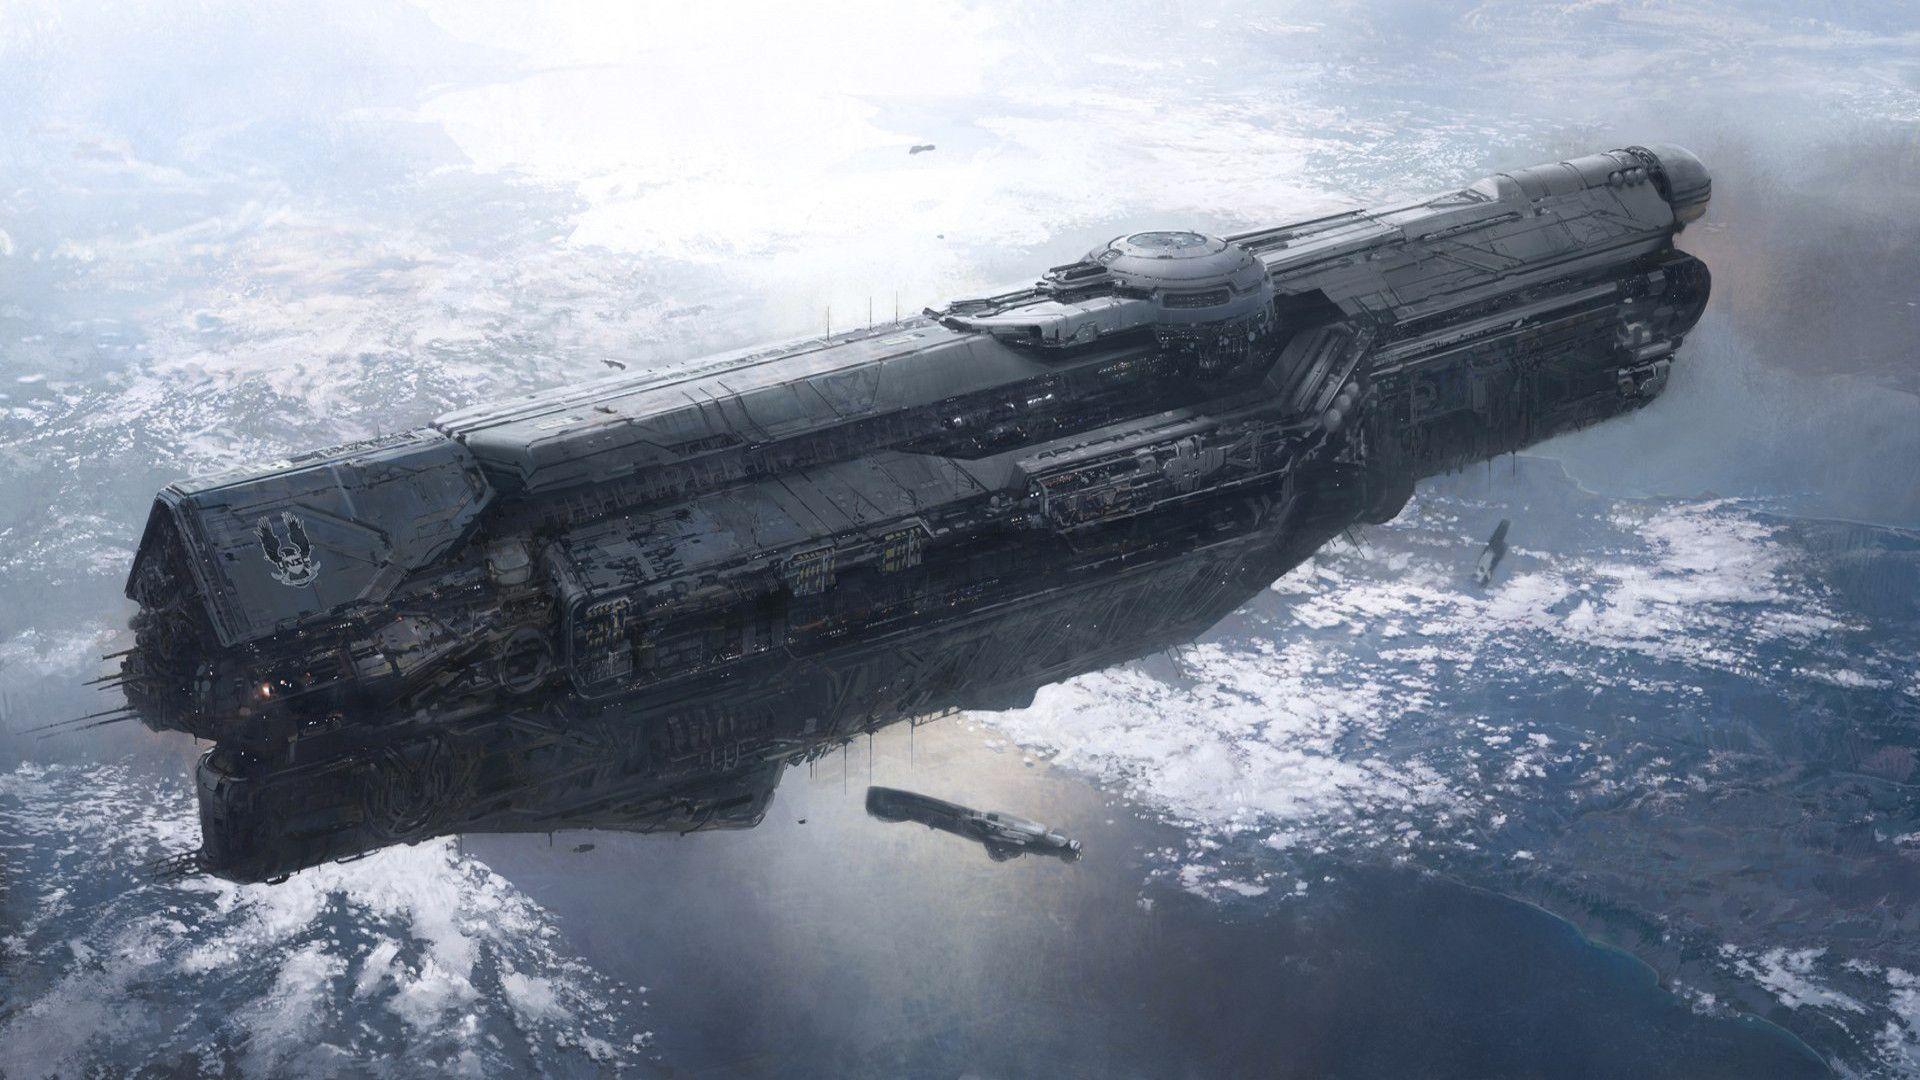 spaceship images